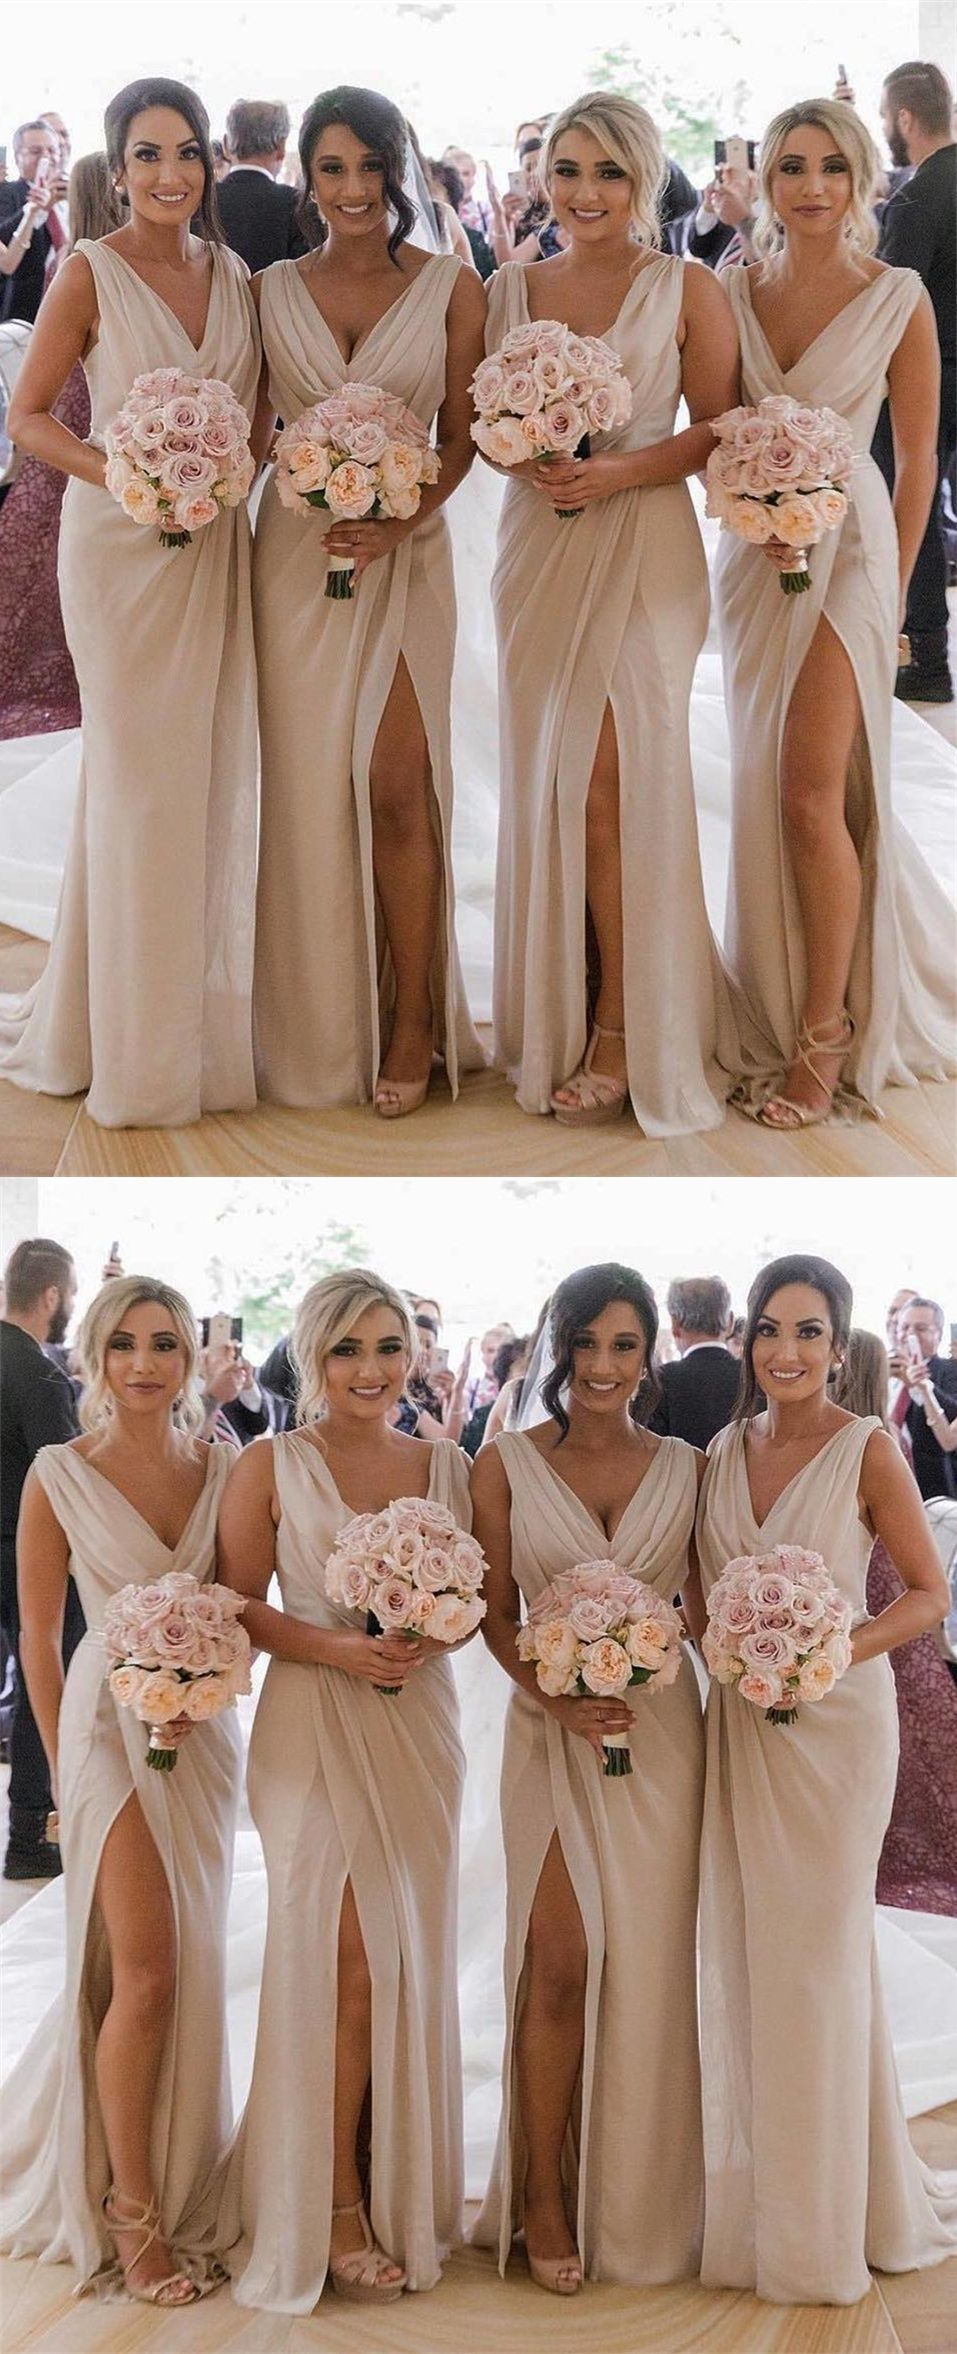 Cheap Champagne Chiffon Long Bridesmaid Dresses Elegant Wedding Party Dresse Mermaid Bridesmaid Dresses Champagne Bridesmaid Dresses Ruffles Bridesmaid Dresses